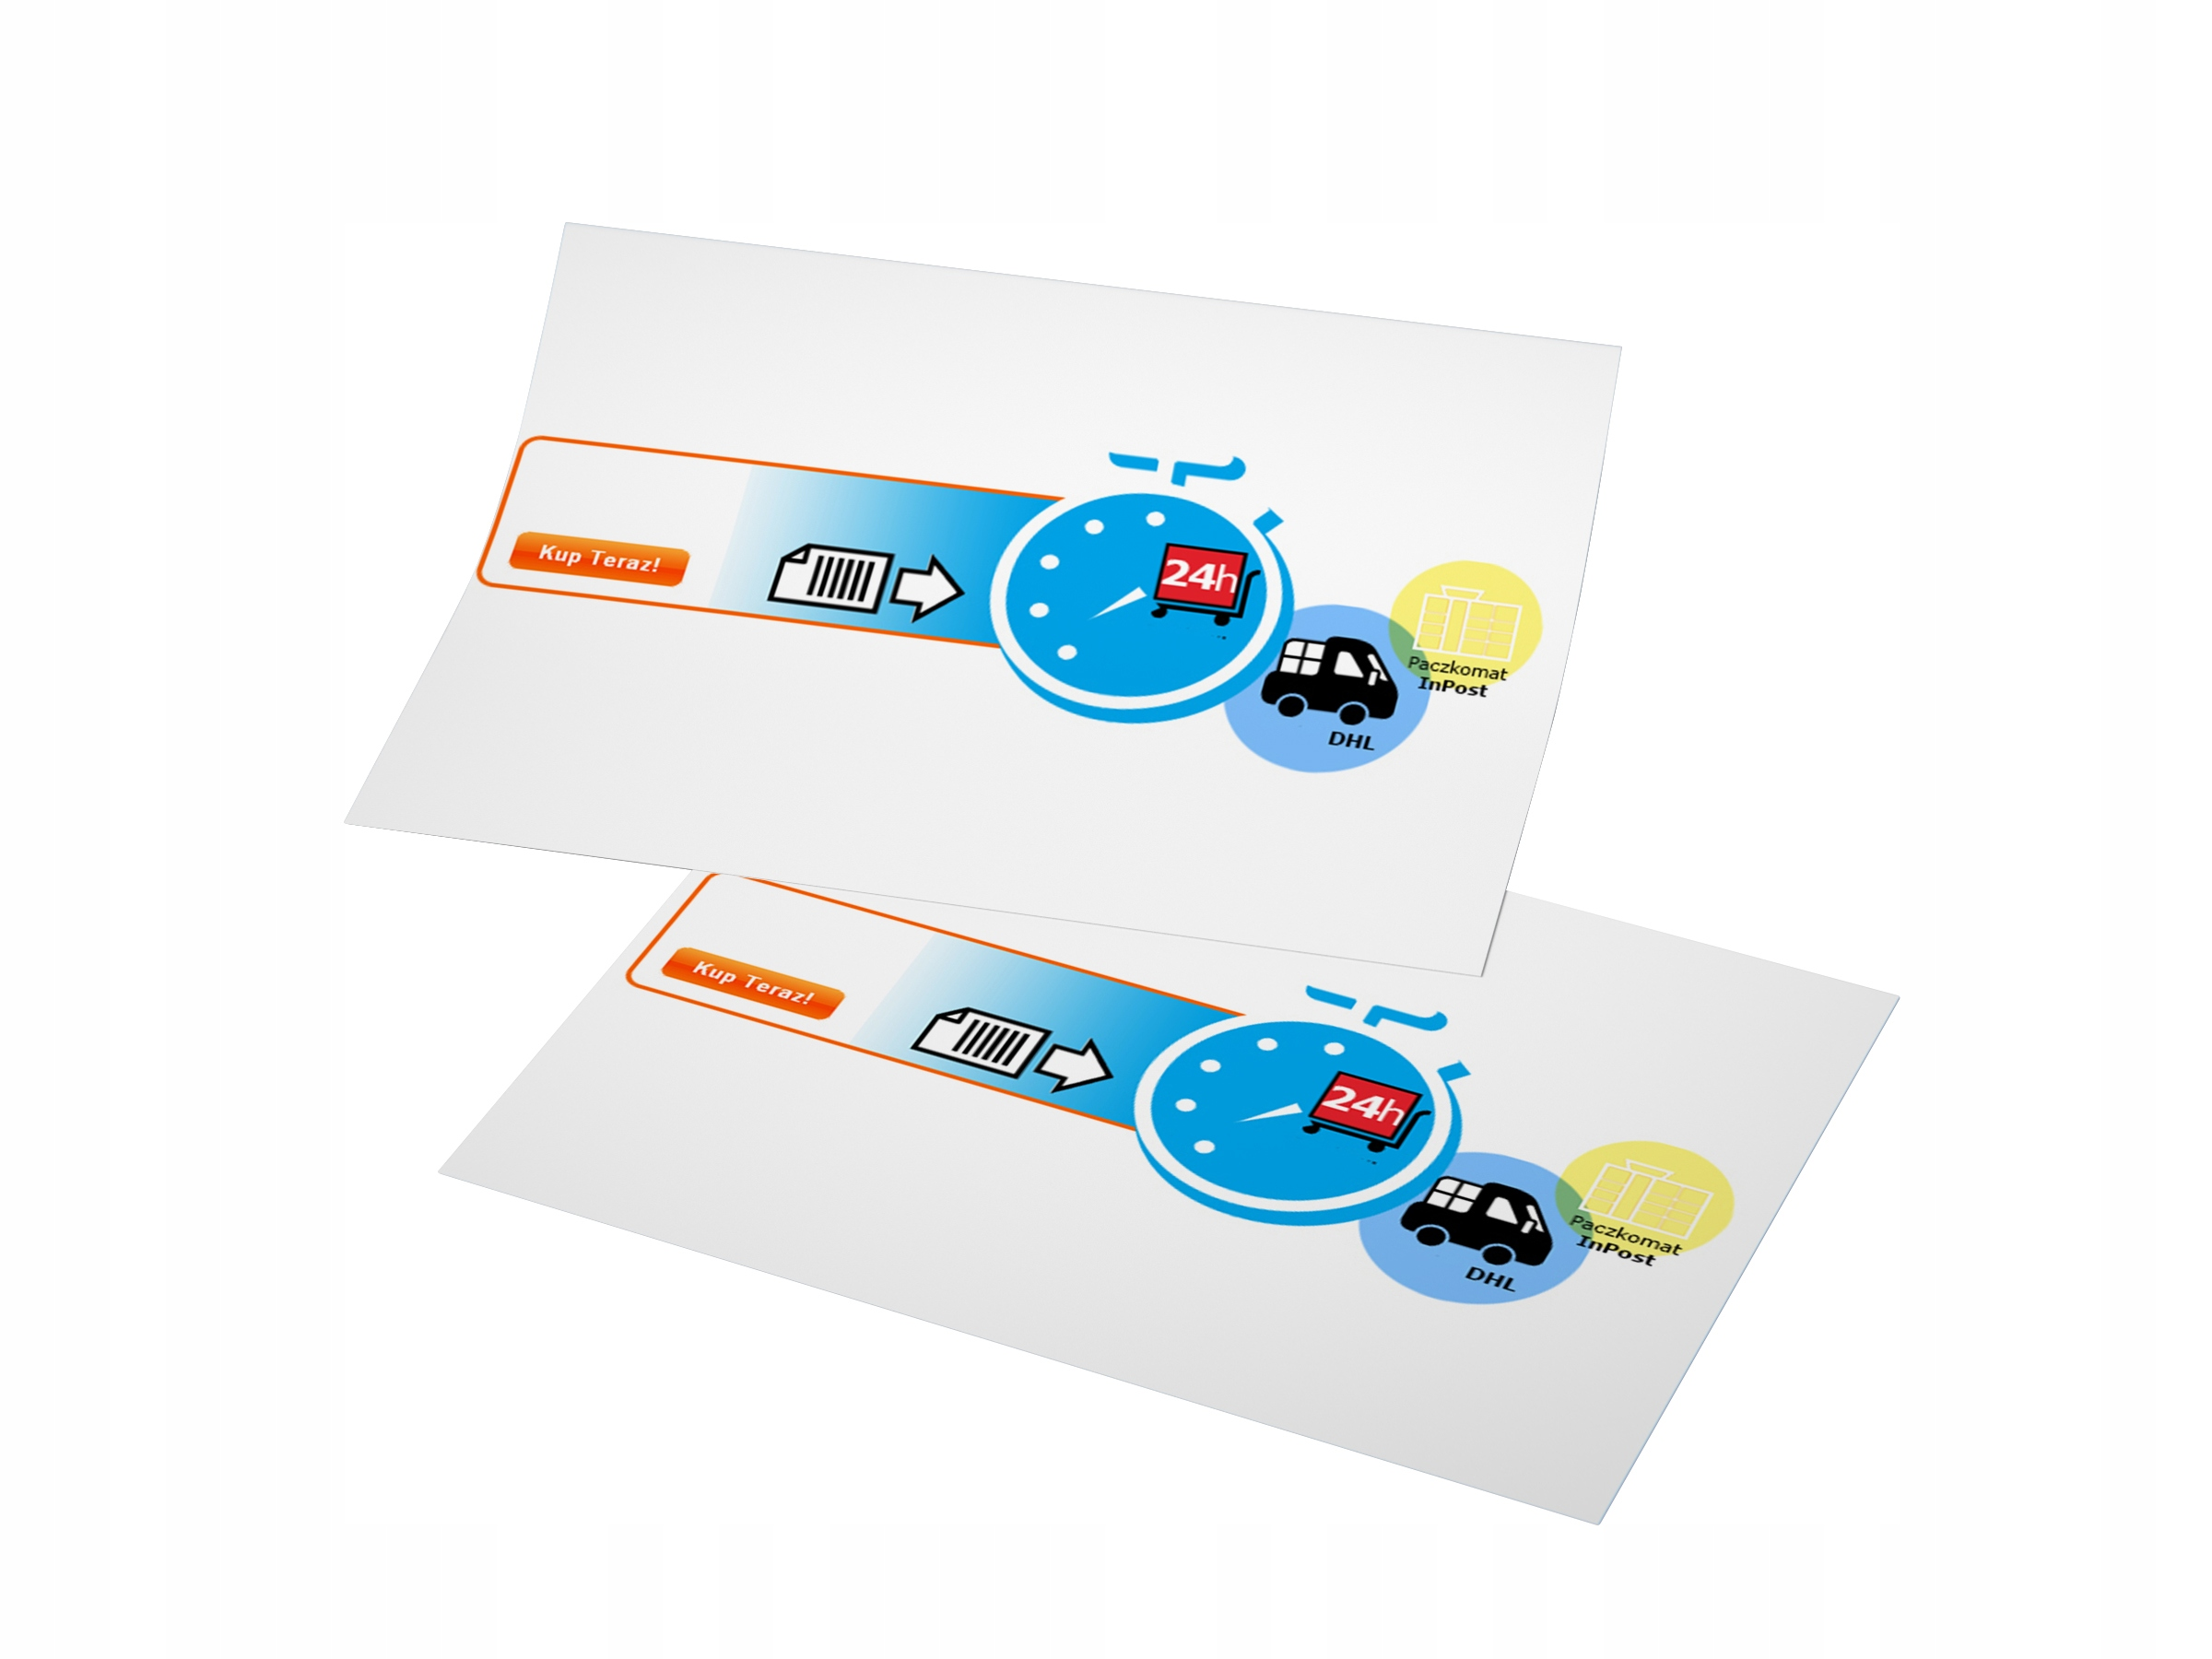 ULOTKI ULOTKA A6 2000 DL 1500 A5 1000 A4 500 170g